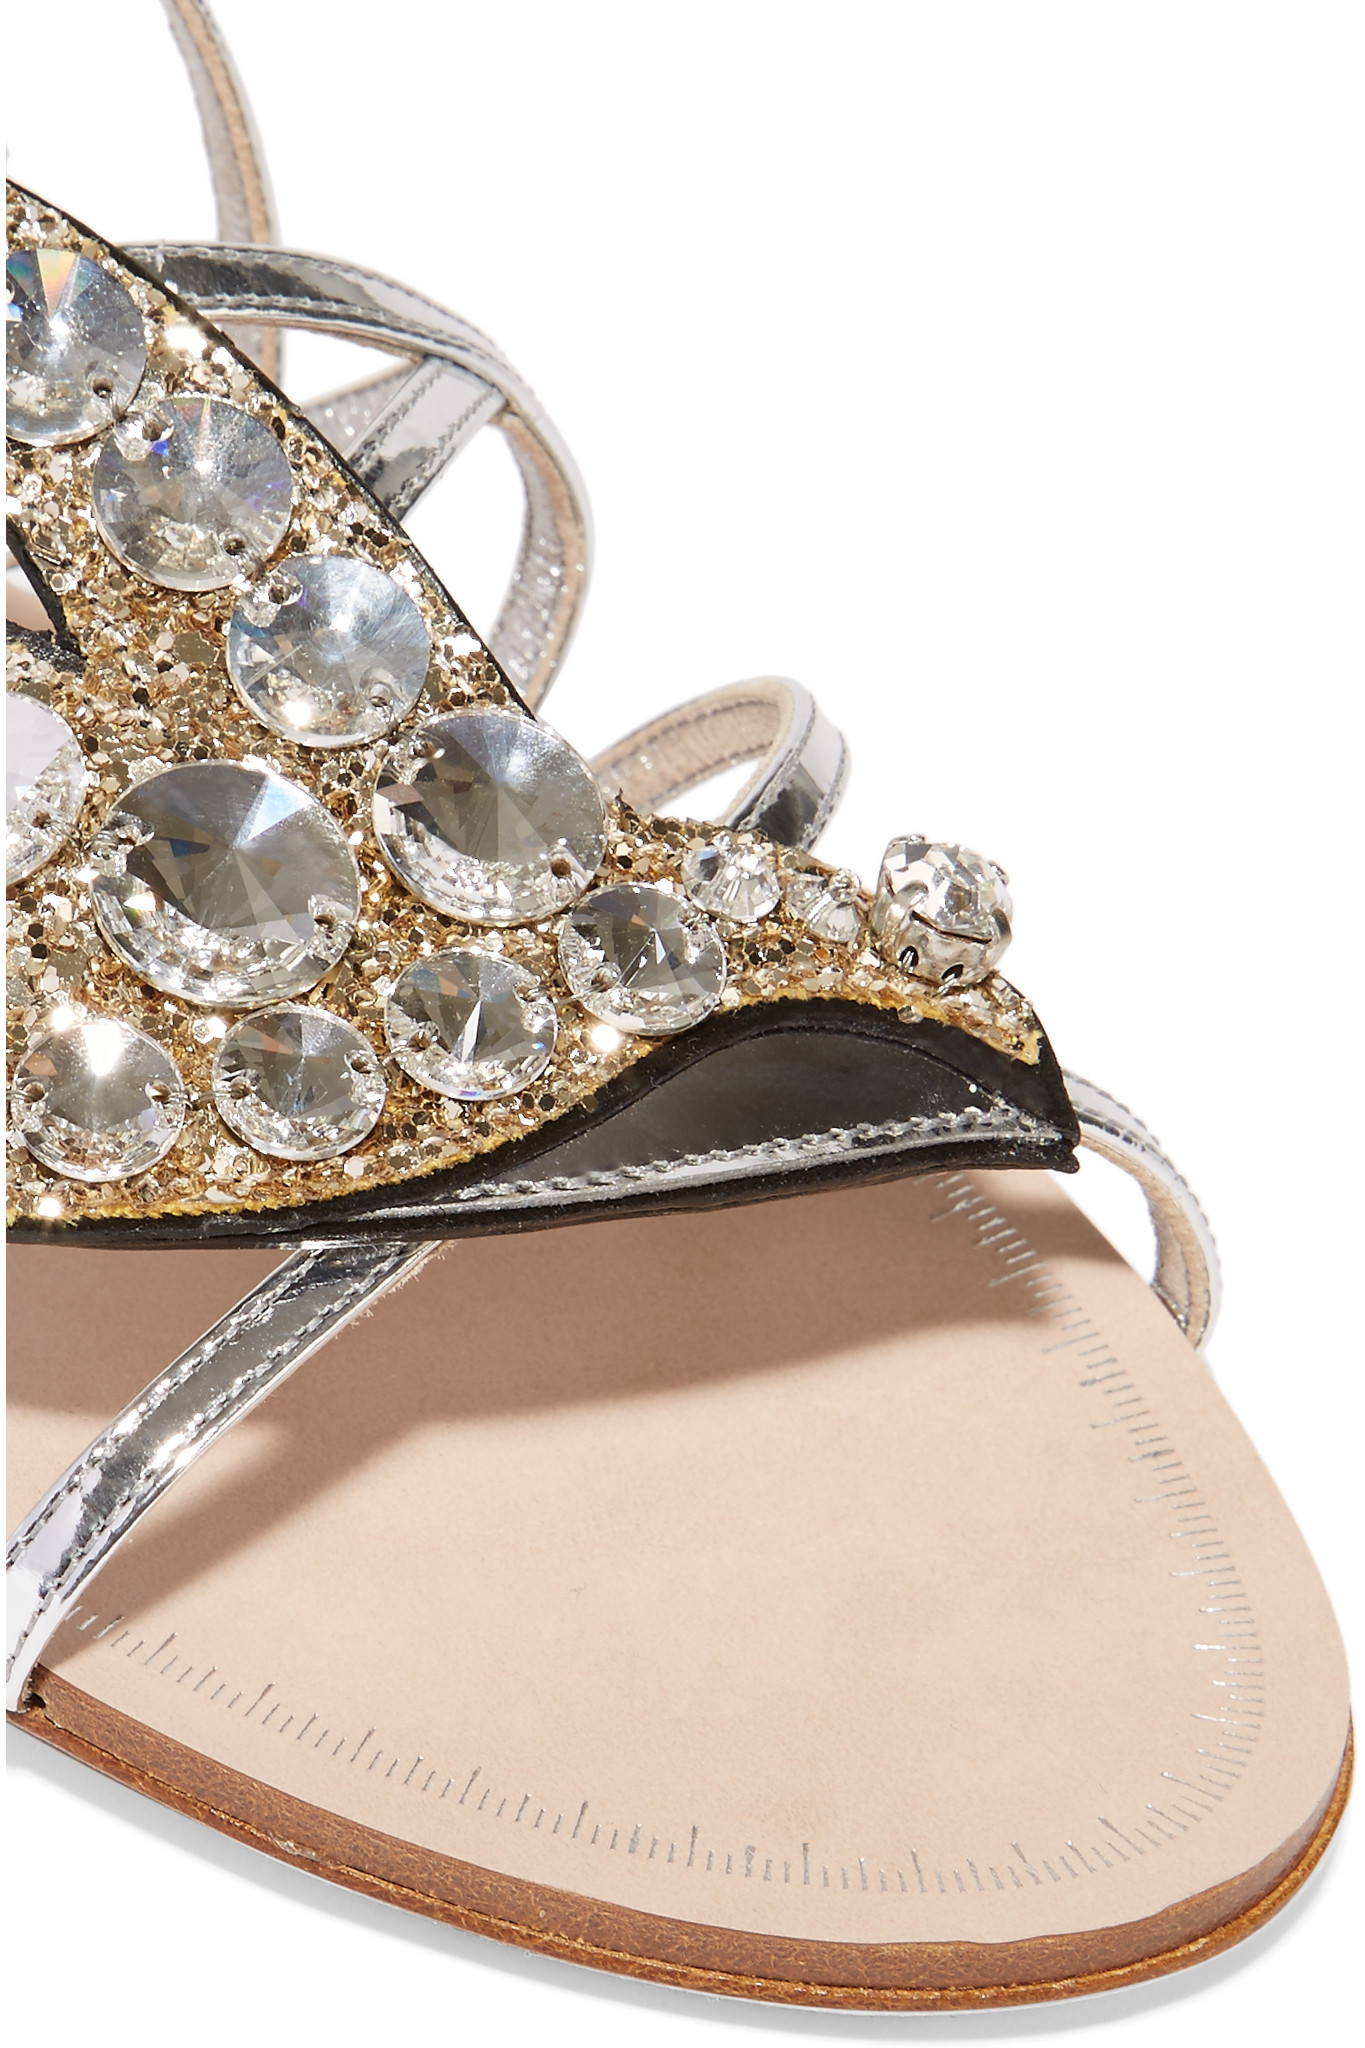 e619e4766eaa Lyst - Miu Miu Swarovski Crystal-embellished Glittered Metallic ...